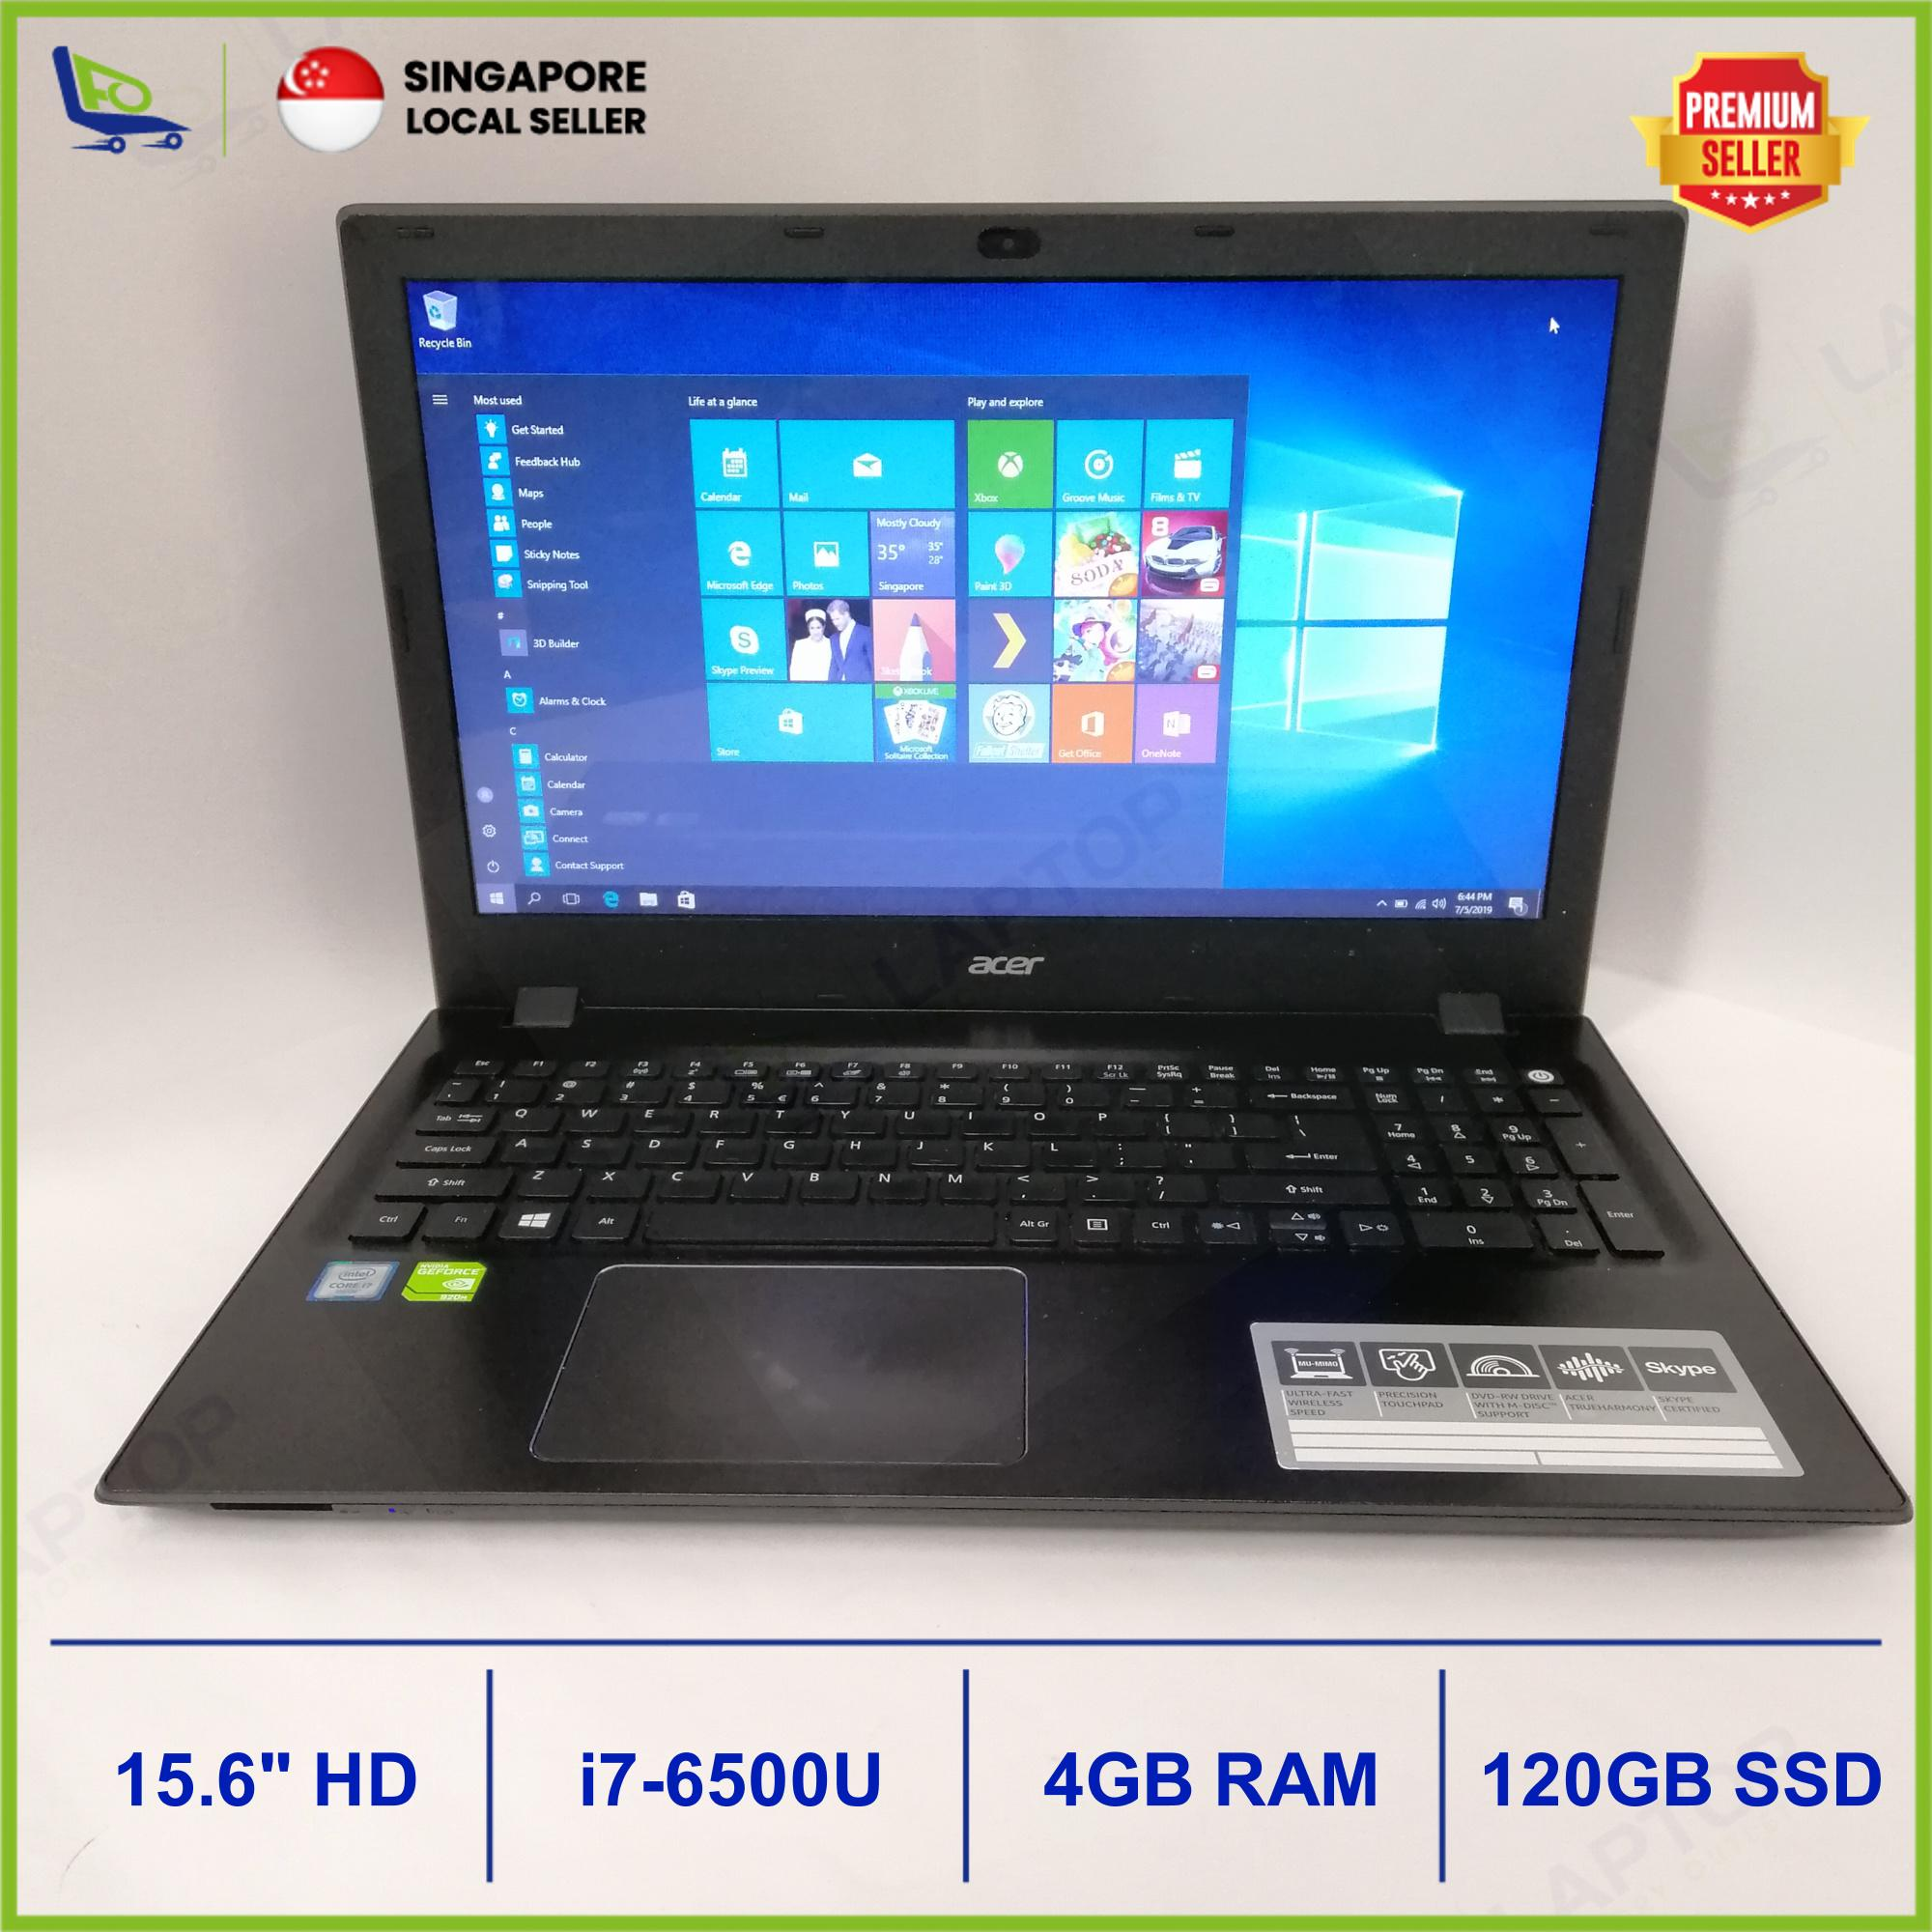 ACER Aspire F5-572G-70FJ (i7-6/4GB/120GB) [Premium Preowned] Refurbished